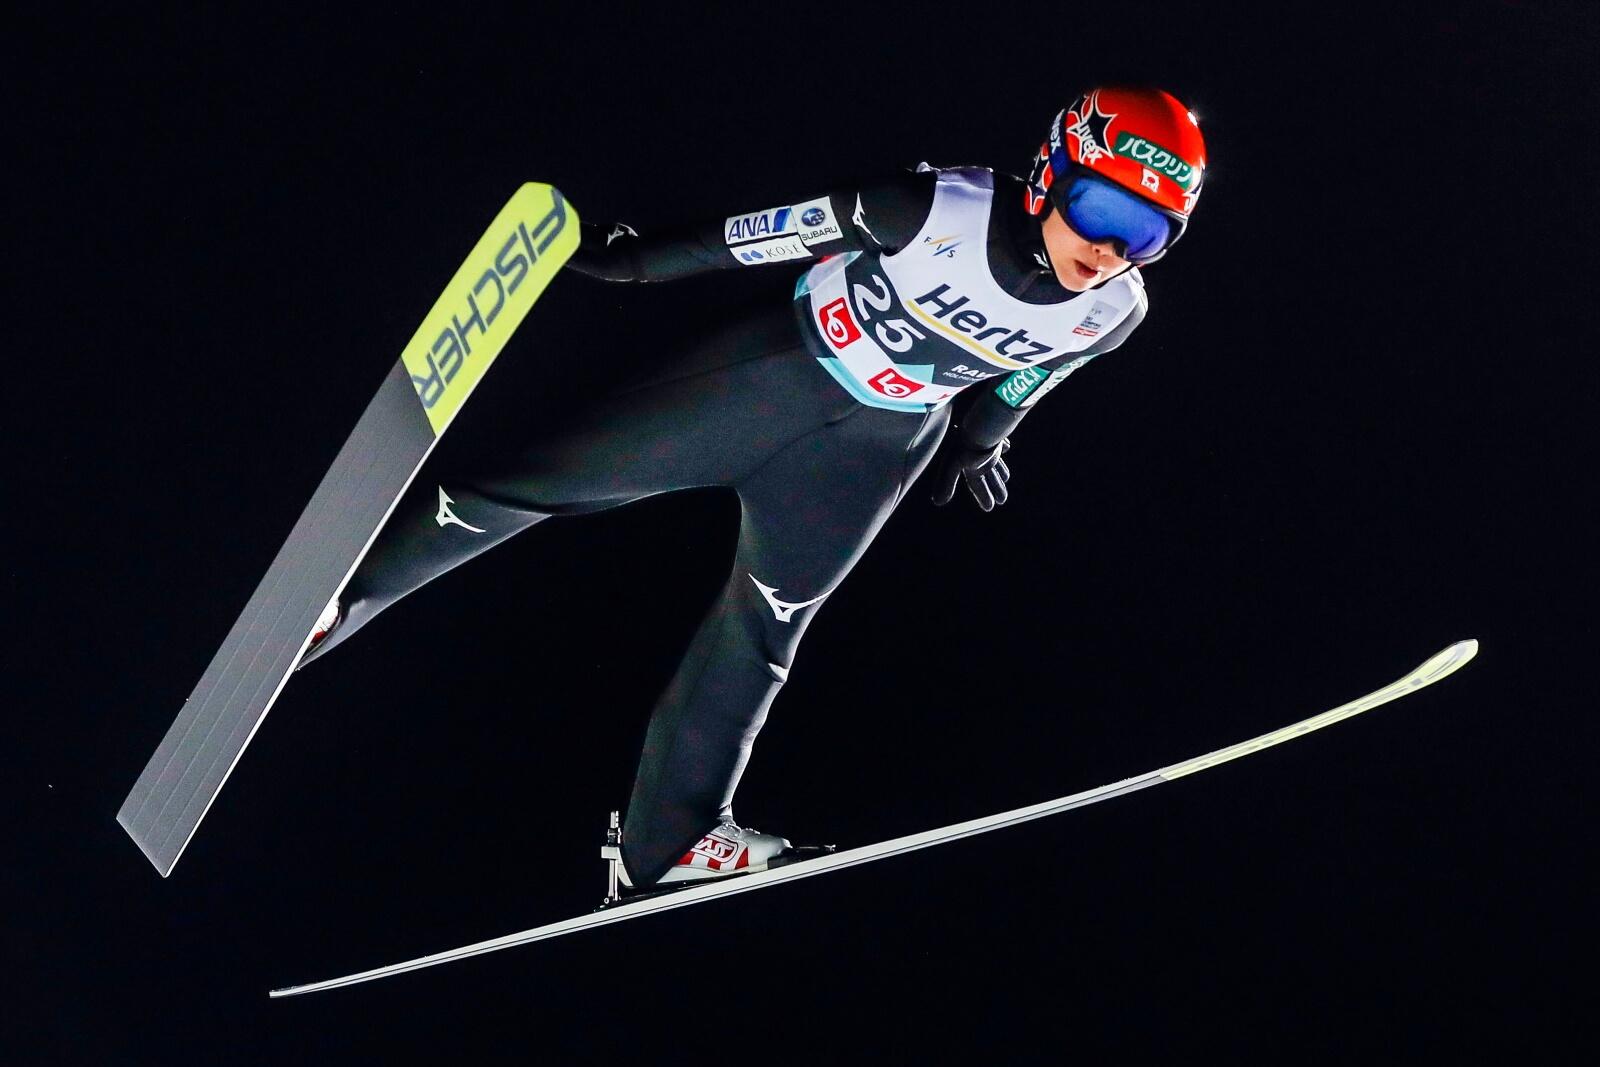 Skoki narciarskie w Lillehammer fot. EPA/GEIR OLSEN